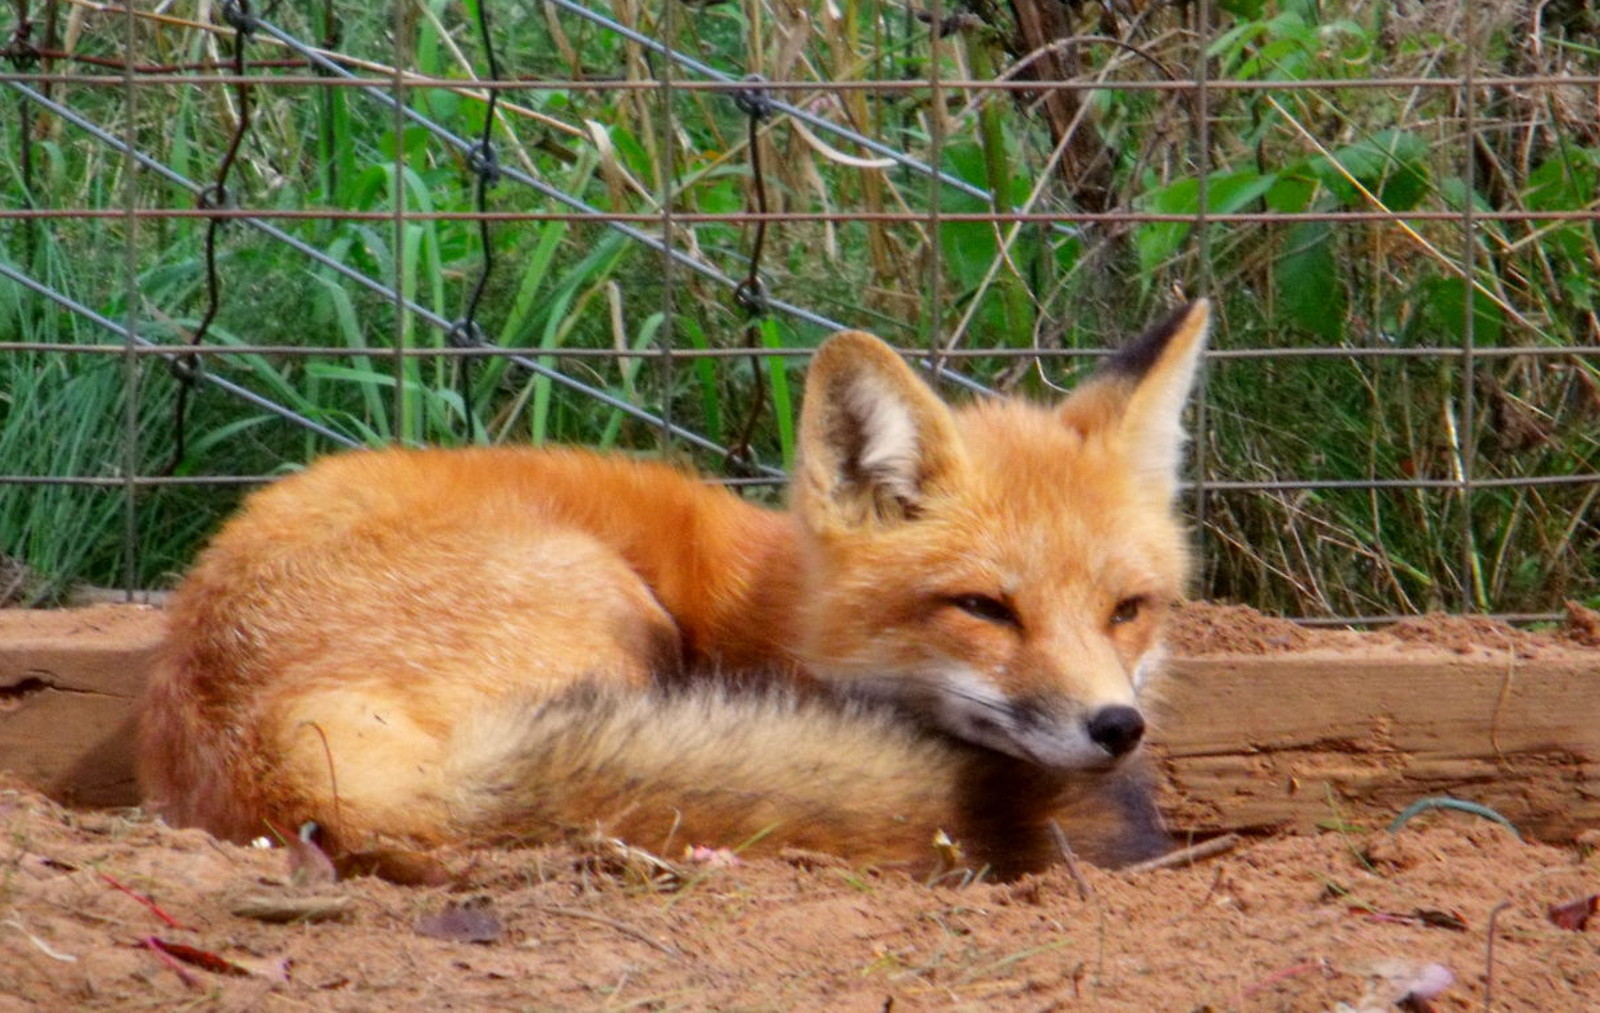 4 Tips for Helping Injured Wildlife